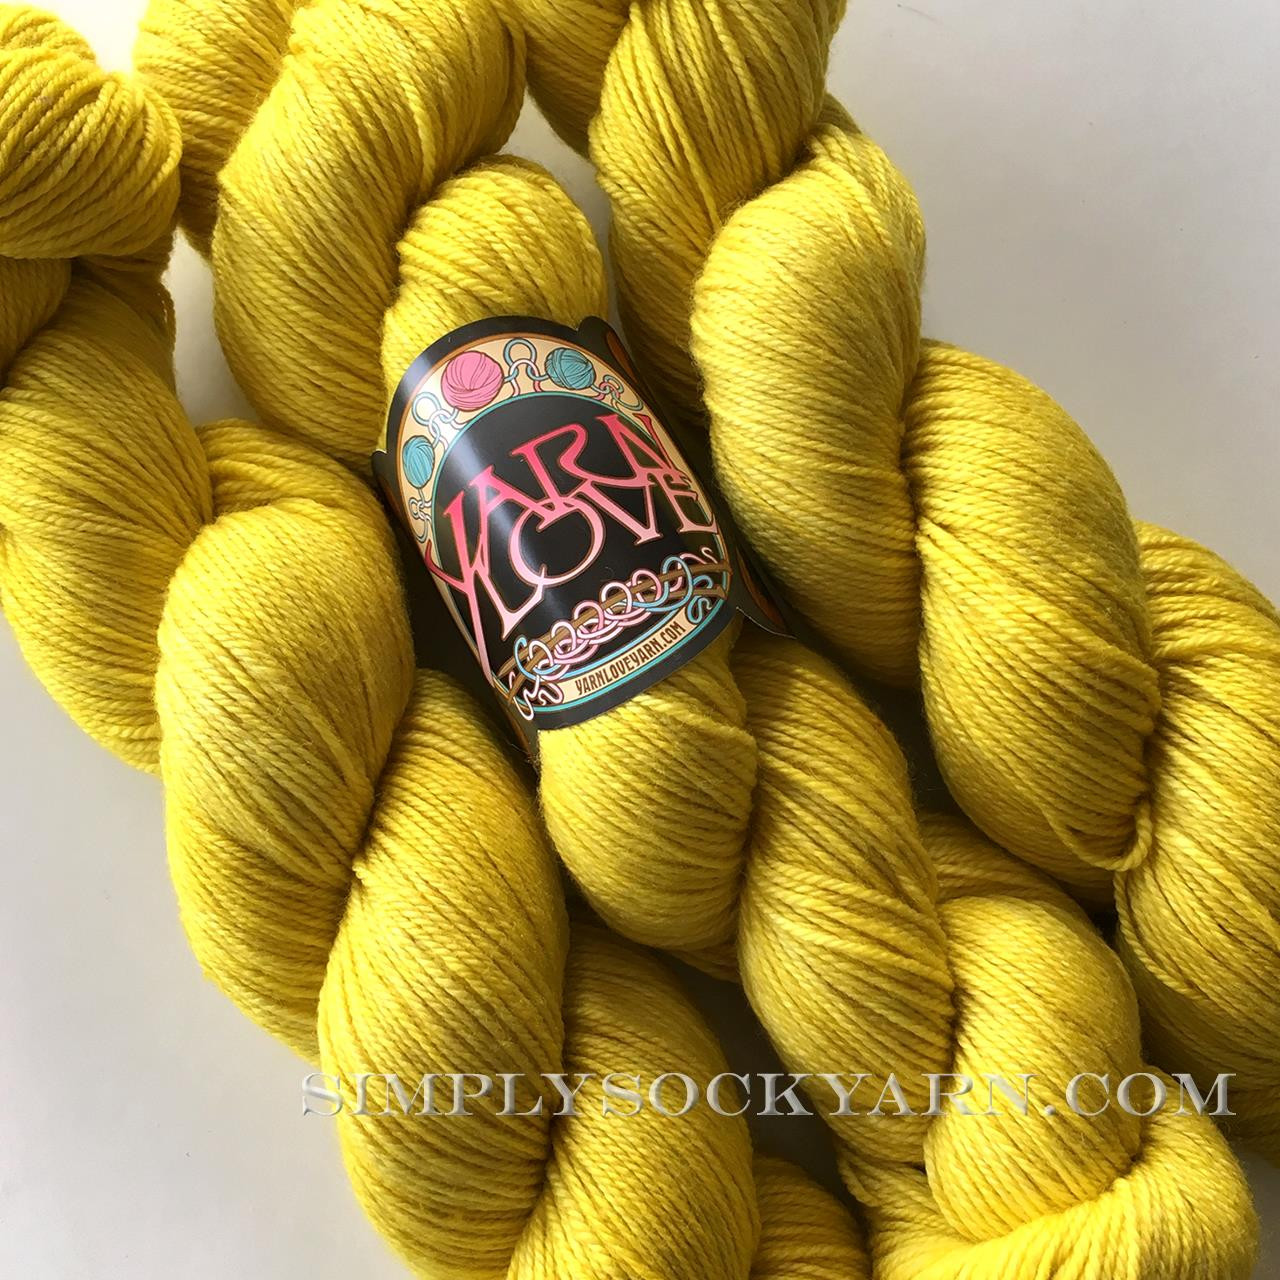 YL Goldilocks Candied Lemon